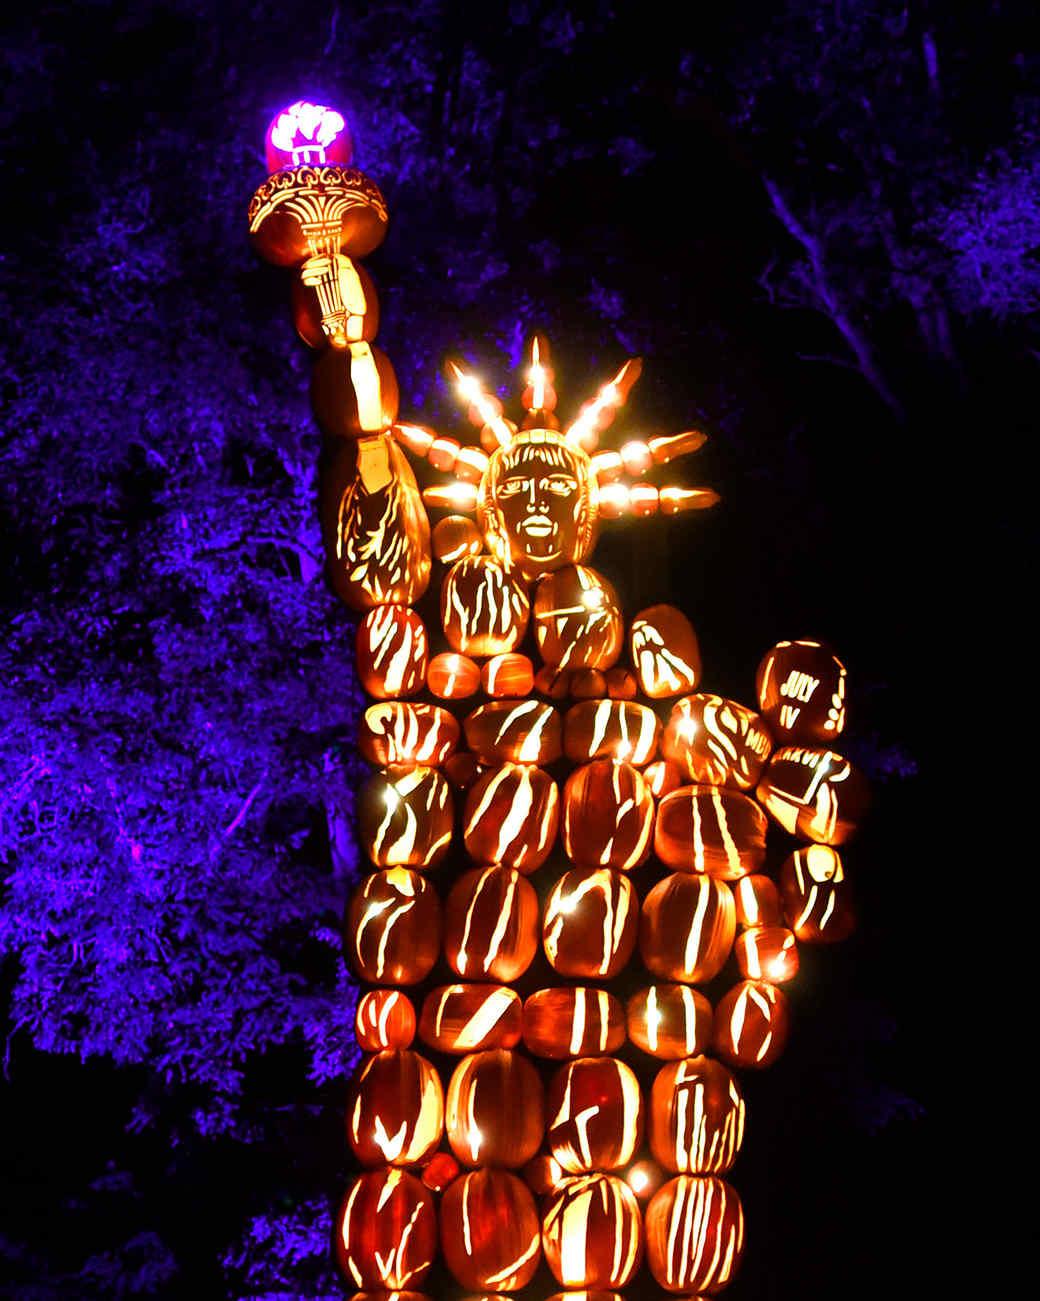 Pumpkin Display at Blaze on Croton on Hudson New York